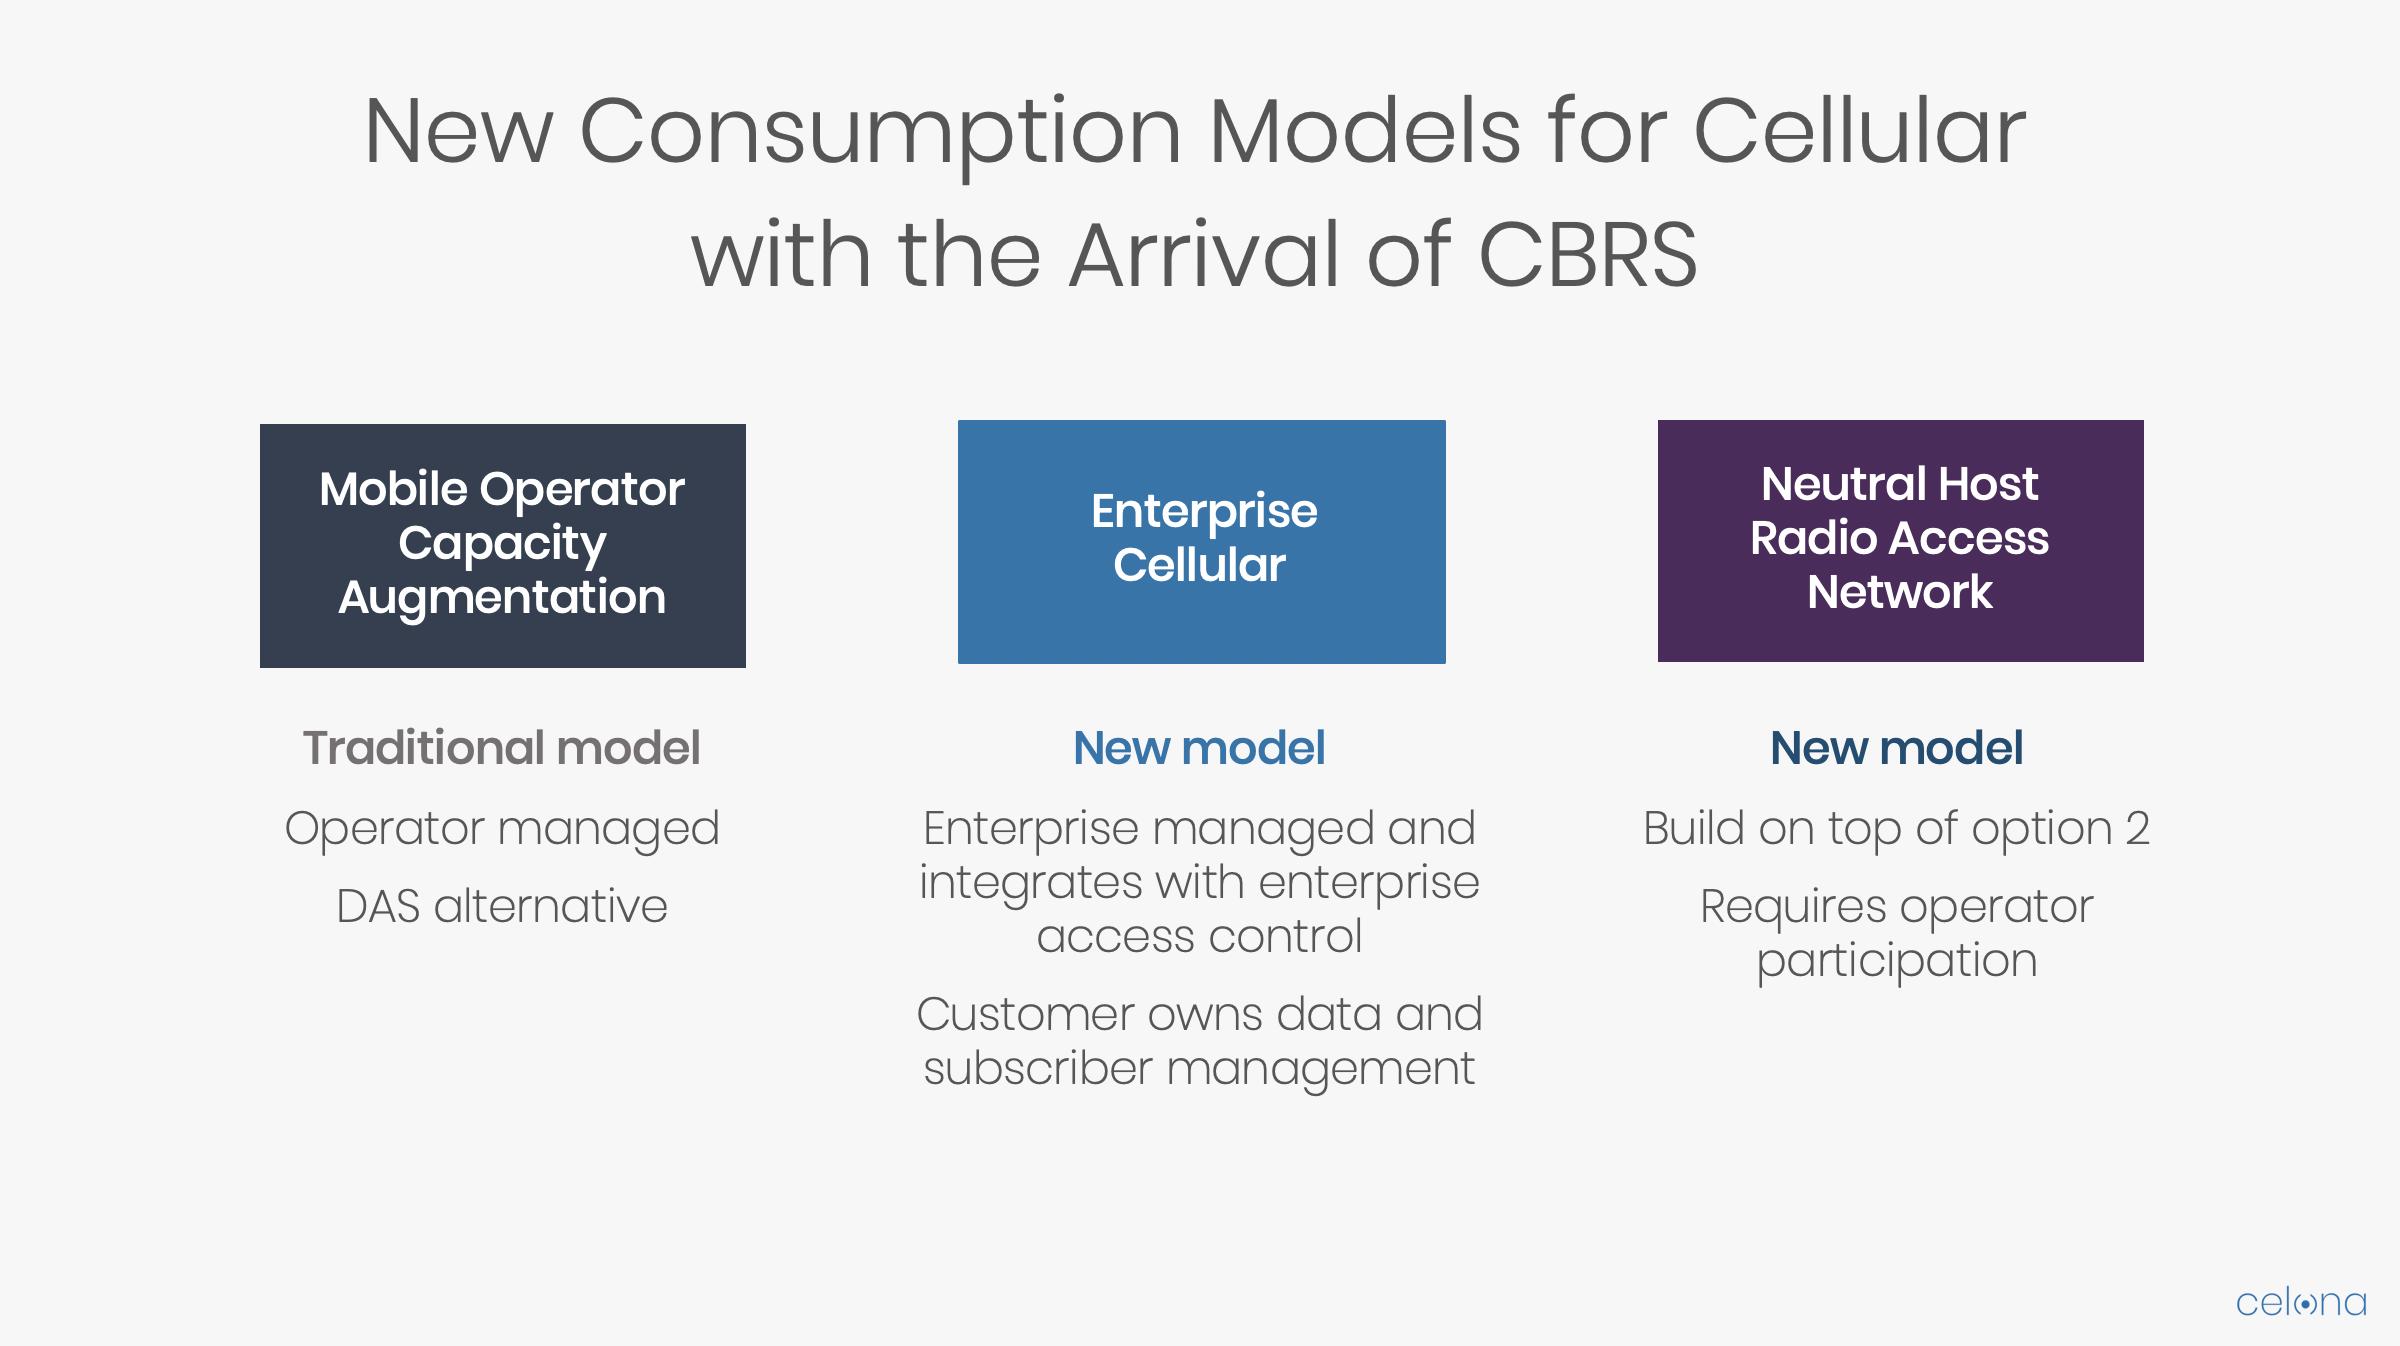 Celona CBRS Consumption Models